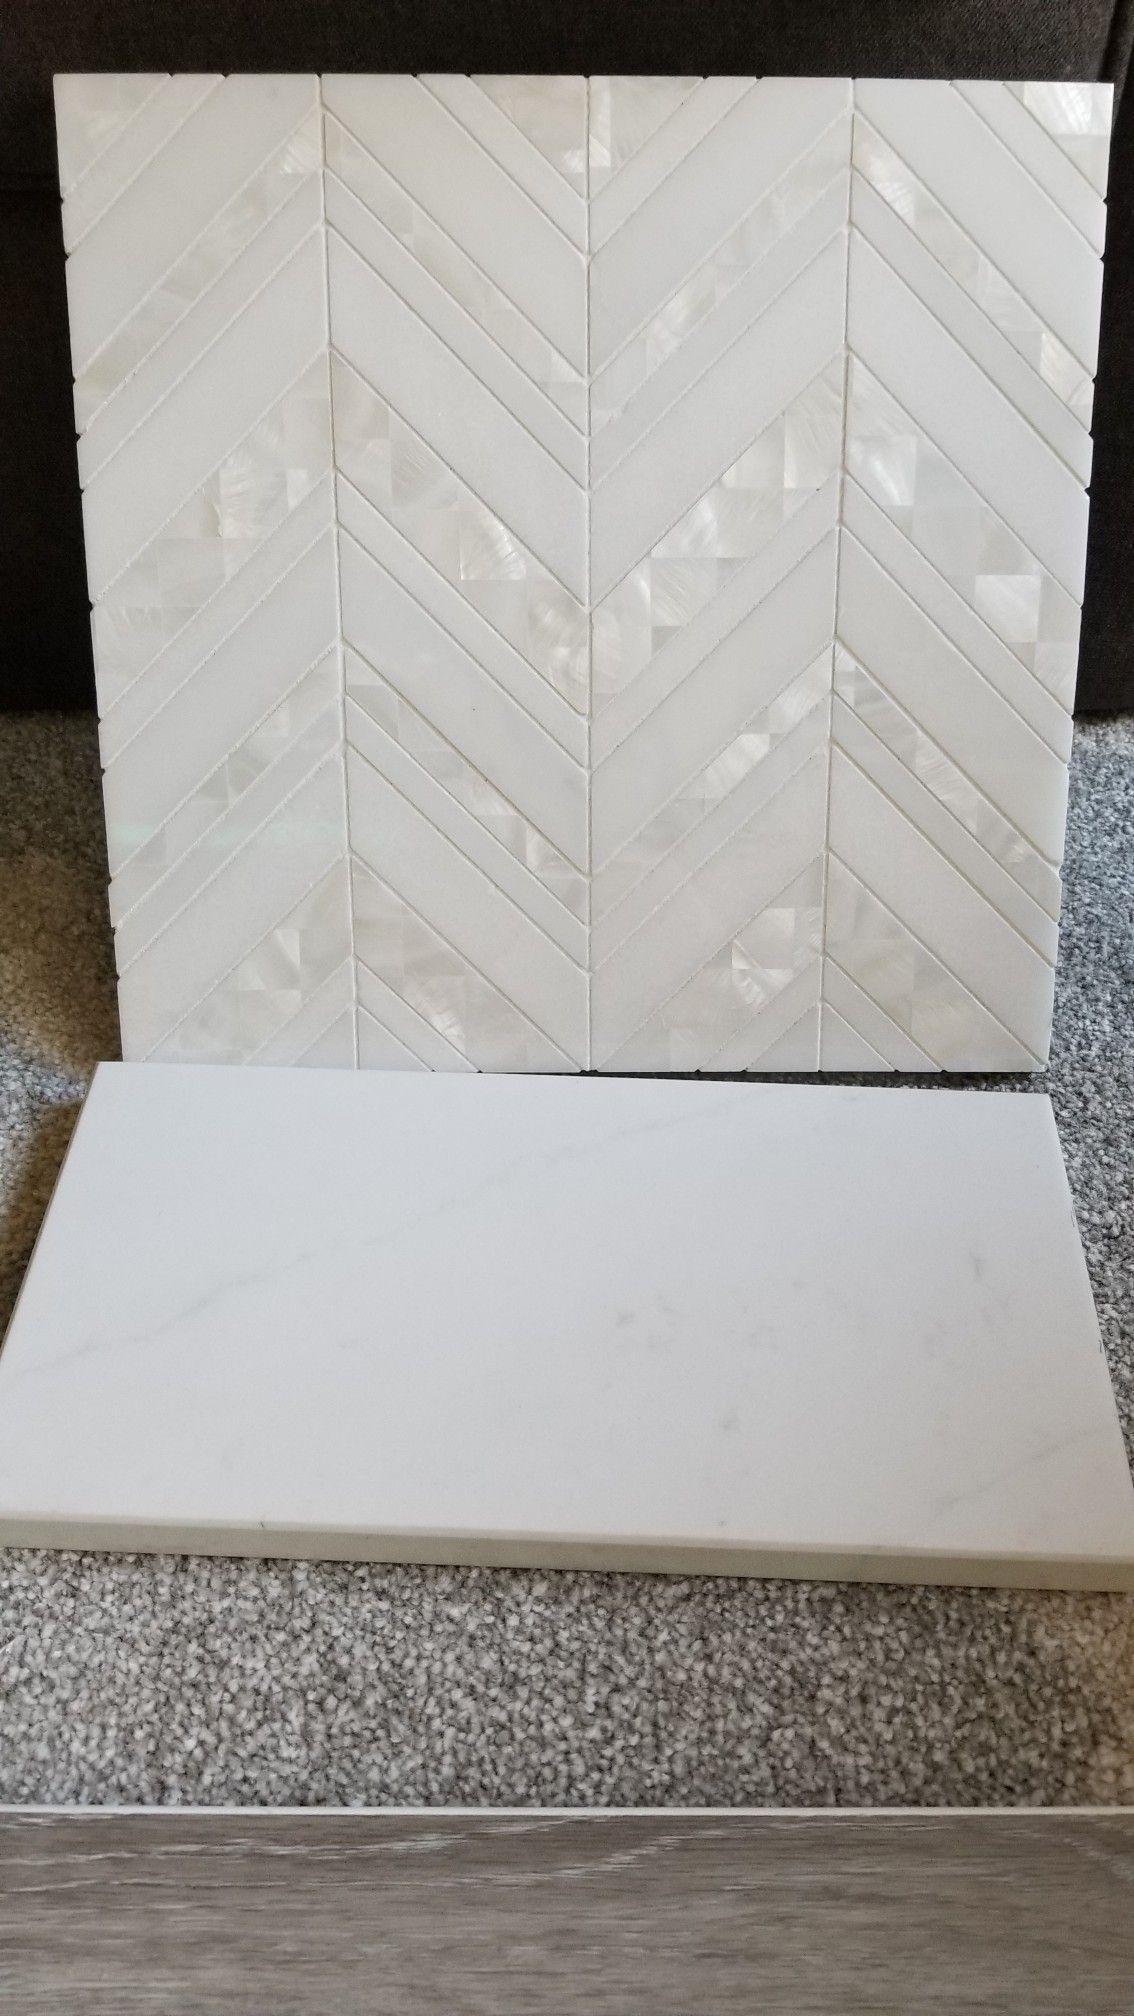 Marble back splash chevron mir mosaic alaska collection pearl island ala c11 grout laticrete - Voir ma maison en direct ...